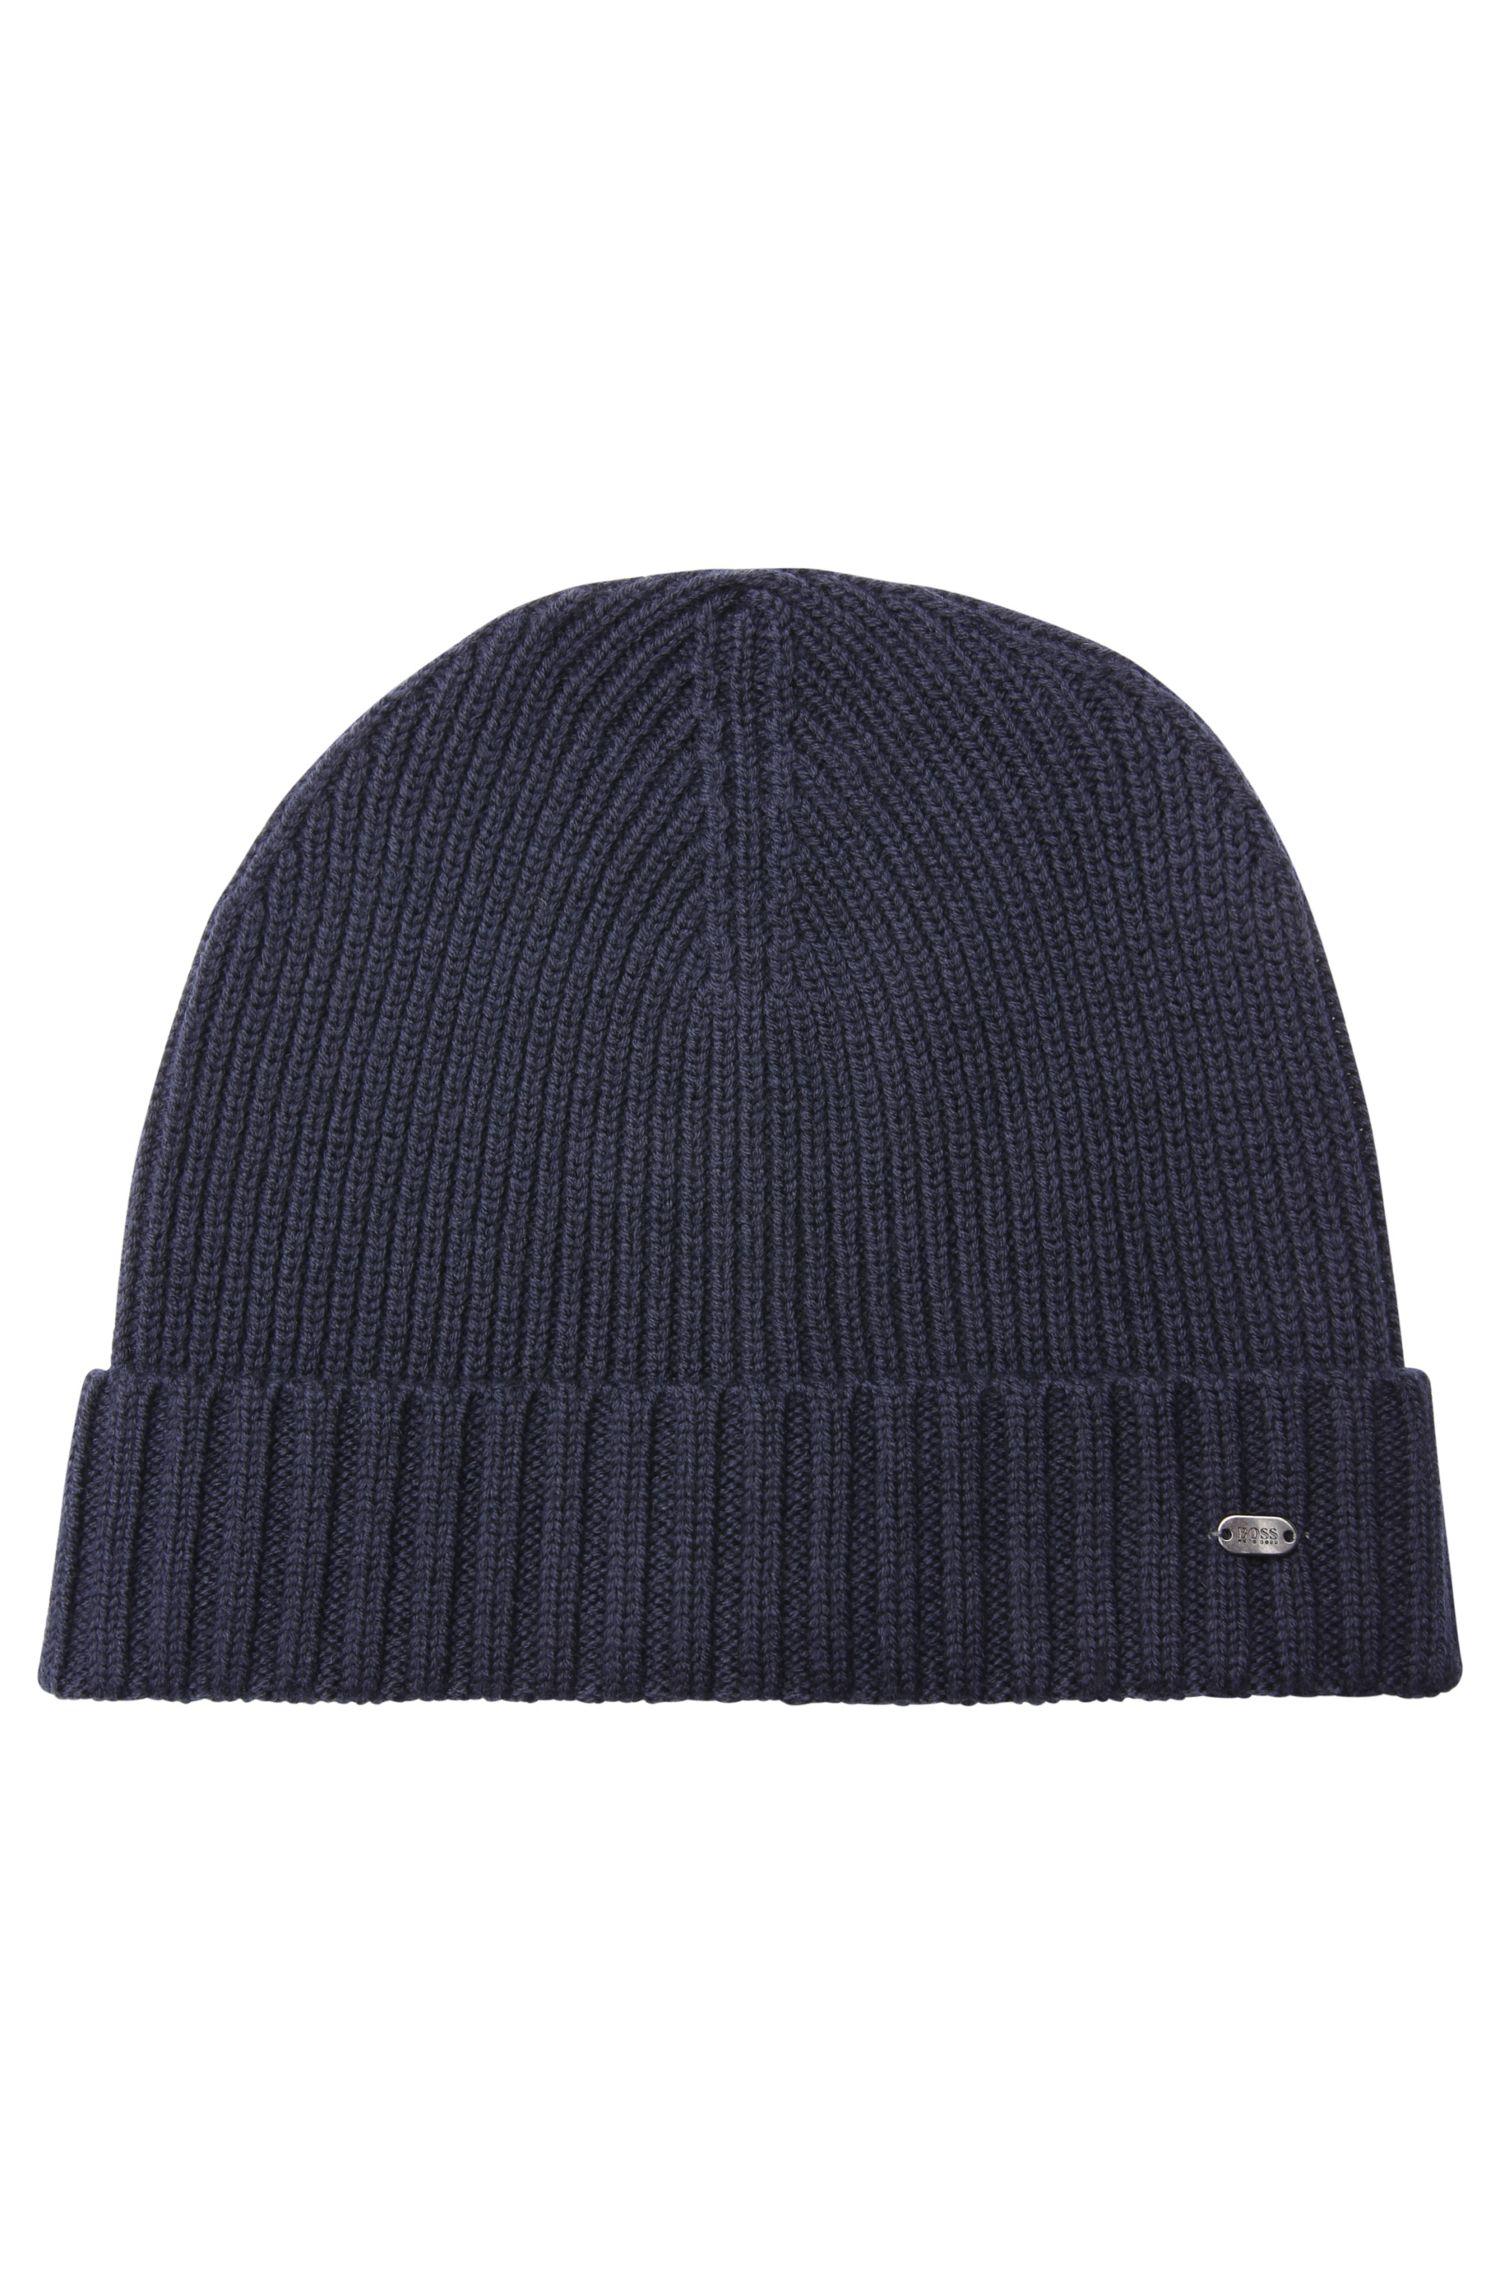 Virgin Wool Beanie | C-Fati, Dark Blue